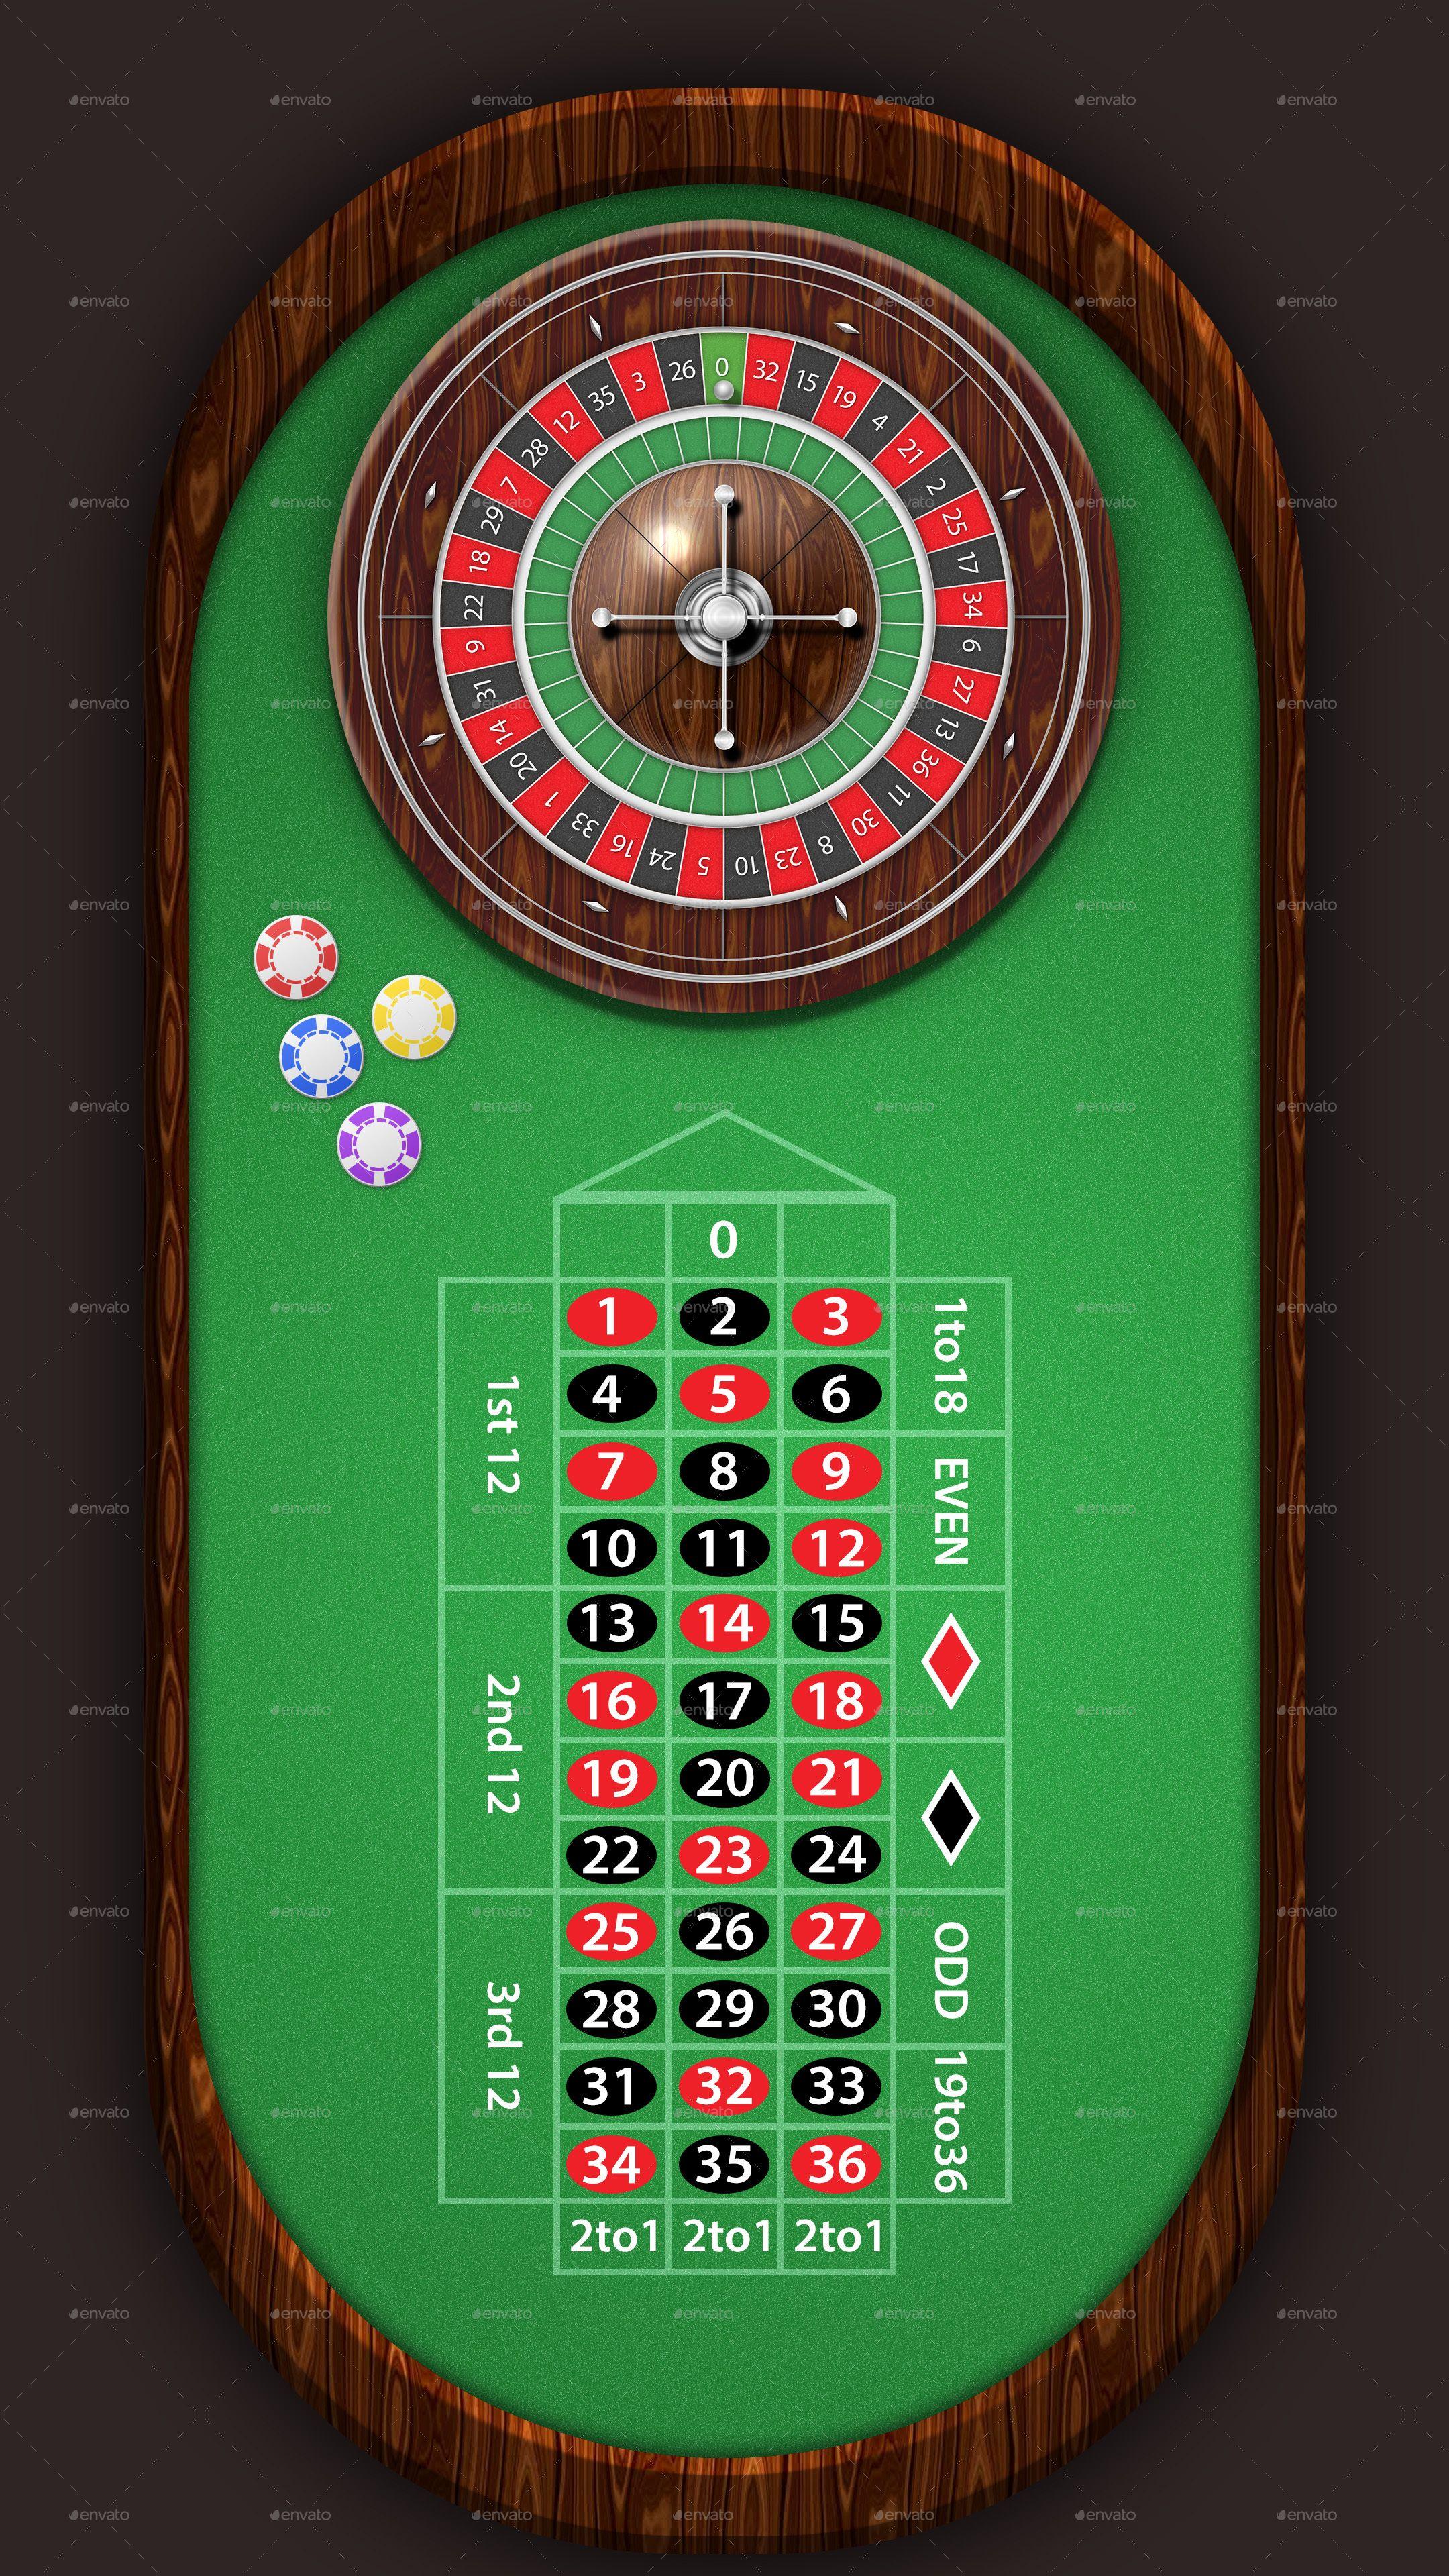 European Roulette Table Pack 4k Ad Roulette Affiliate European Pack Table Roulette Table Roulette 5 Card Poker